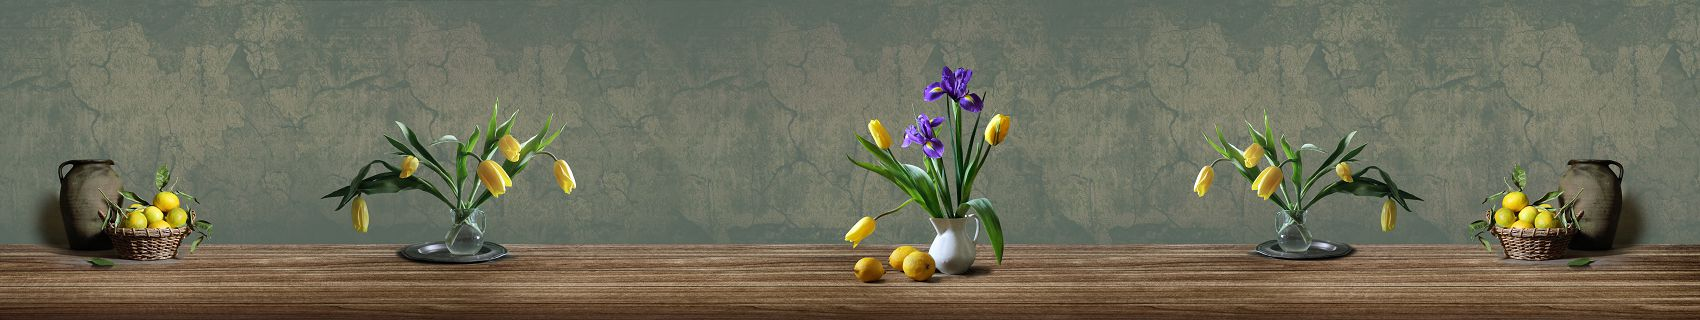 Тюльпаны и ирис